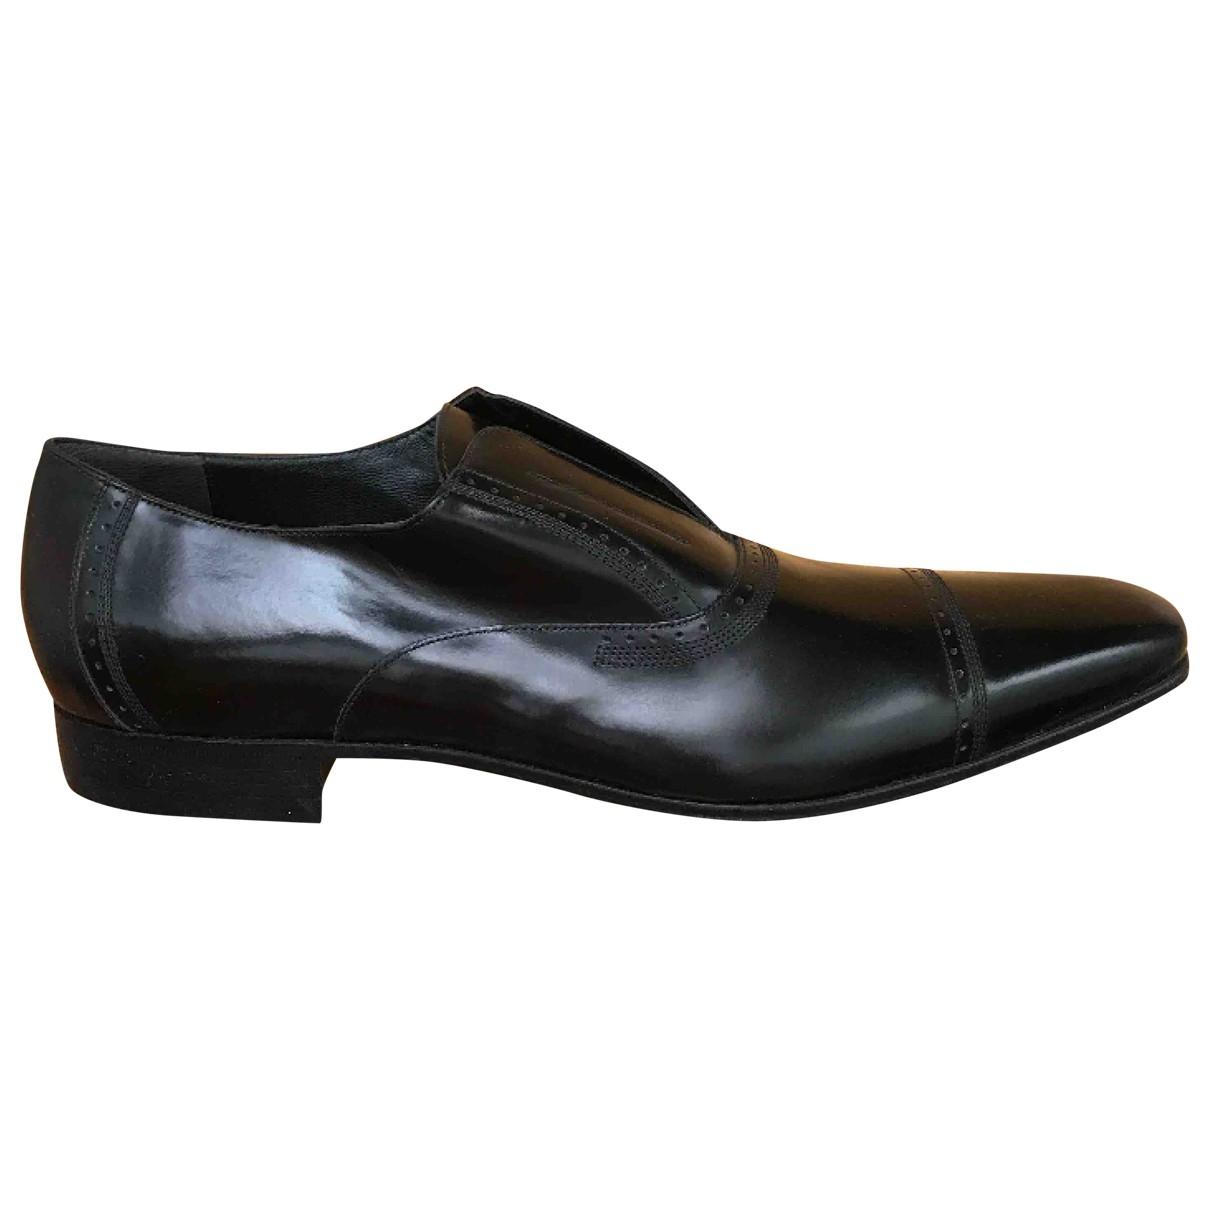 D&g \N Black Leather Flats for Men 44 IT